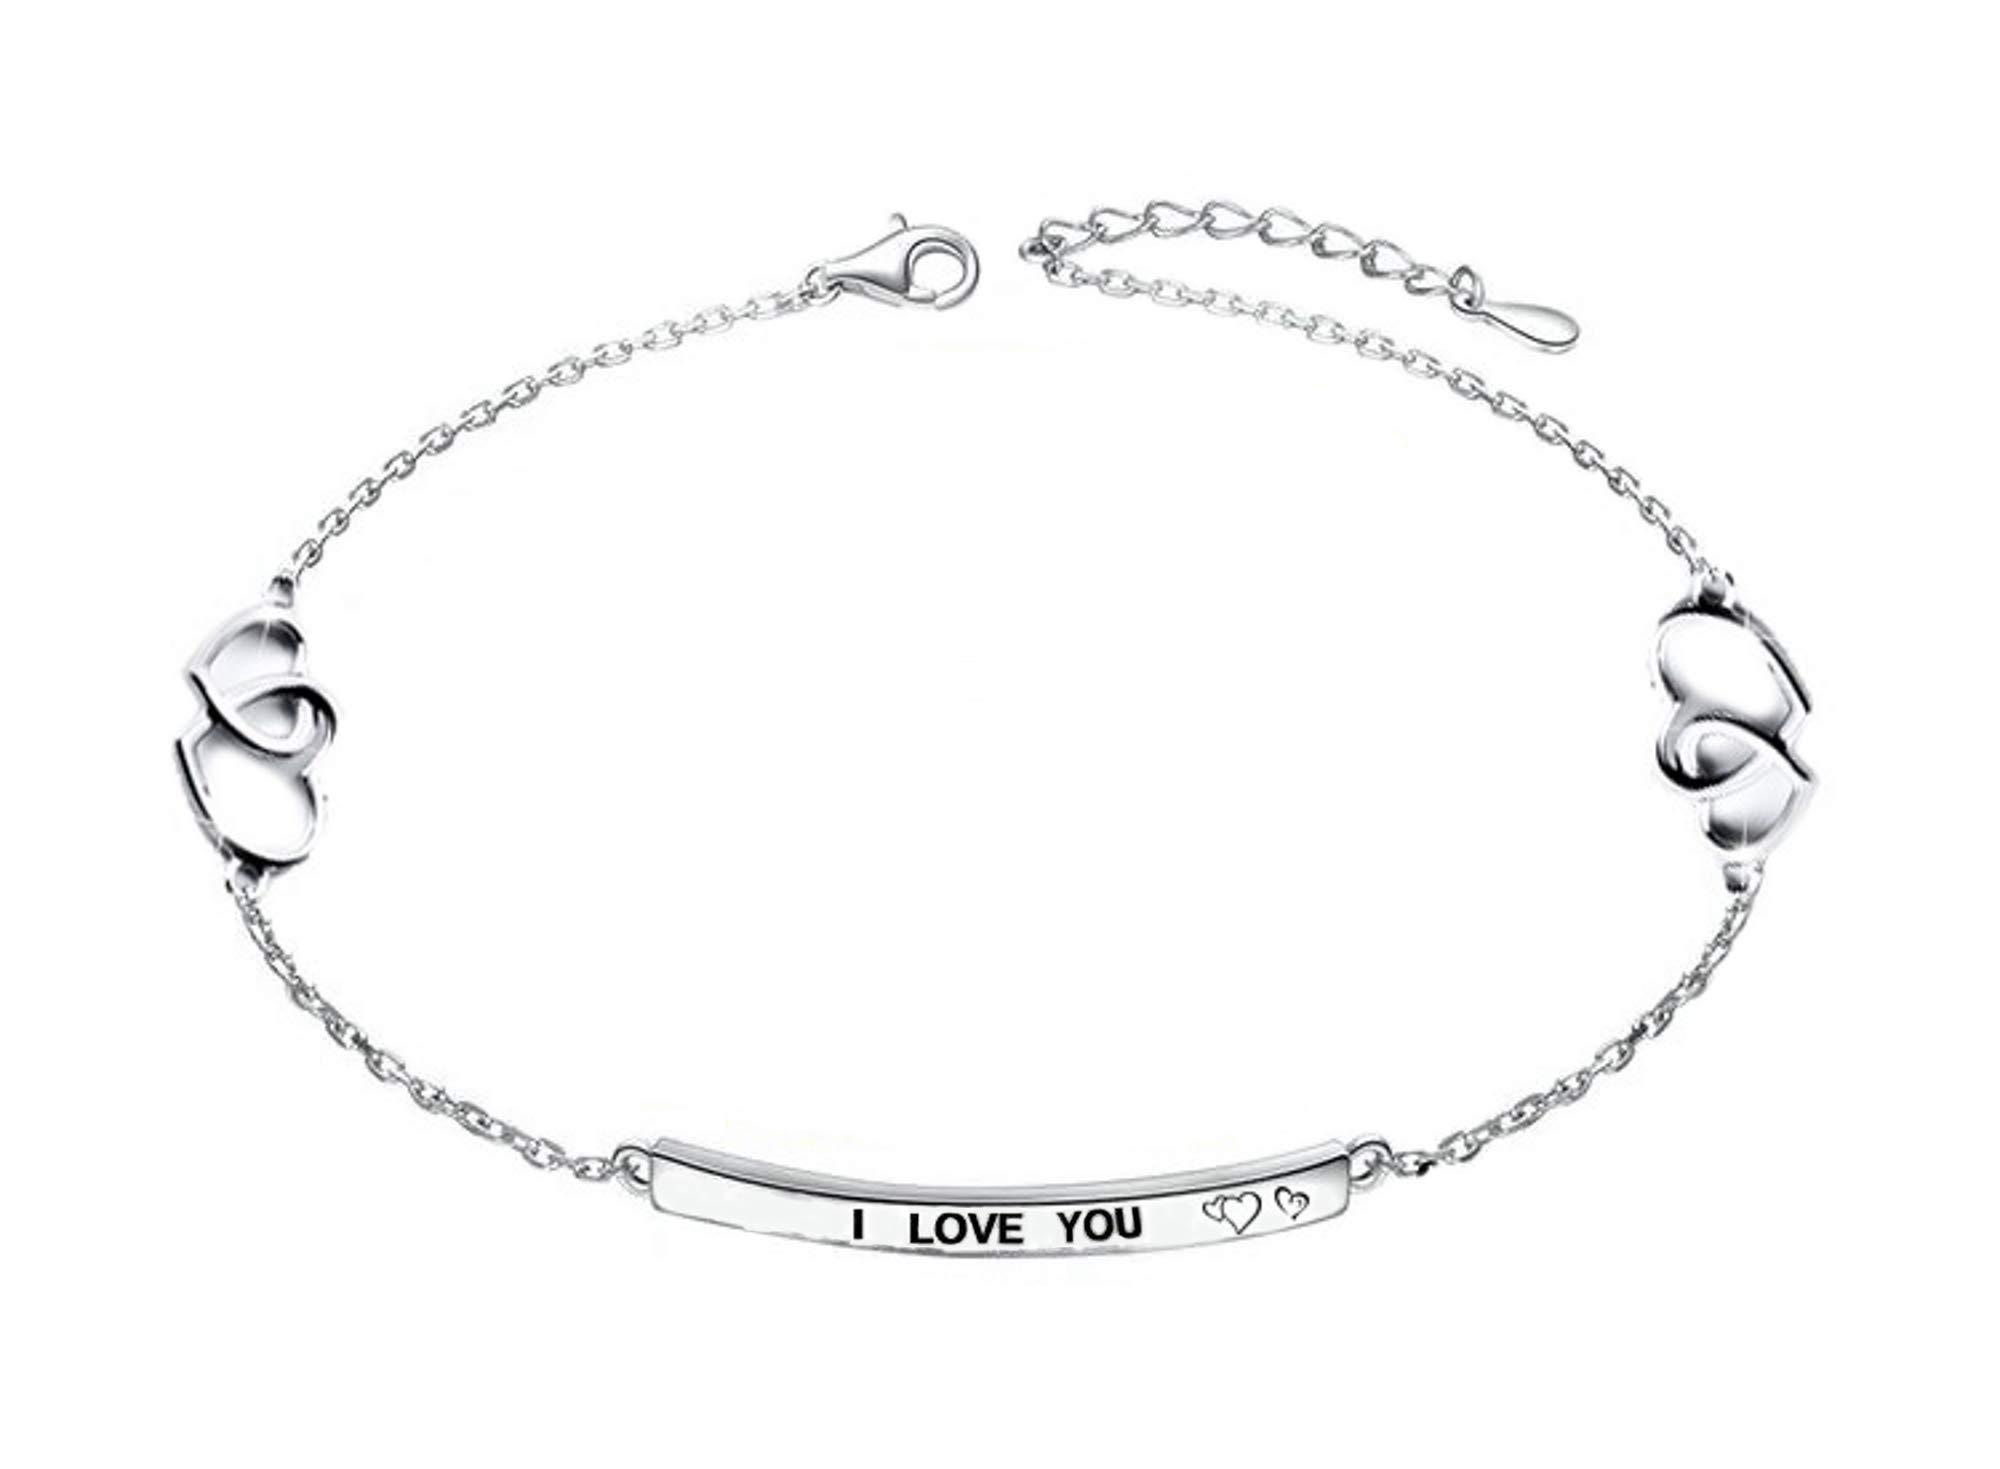 Peterpanshop Heart Shape Popular Anklet for Women 925 Sterling Silver Color Adjustable Foot bracelet Vintage Jewelry (Style-A)